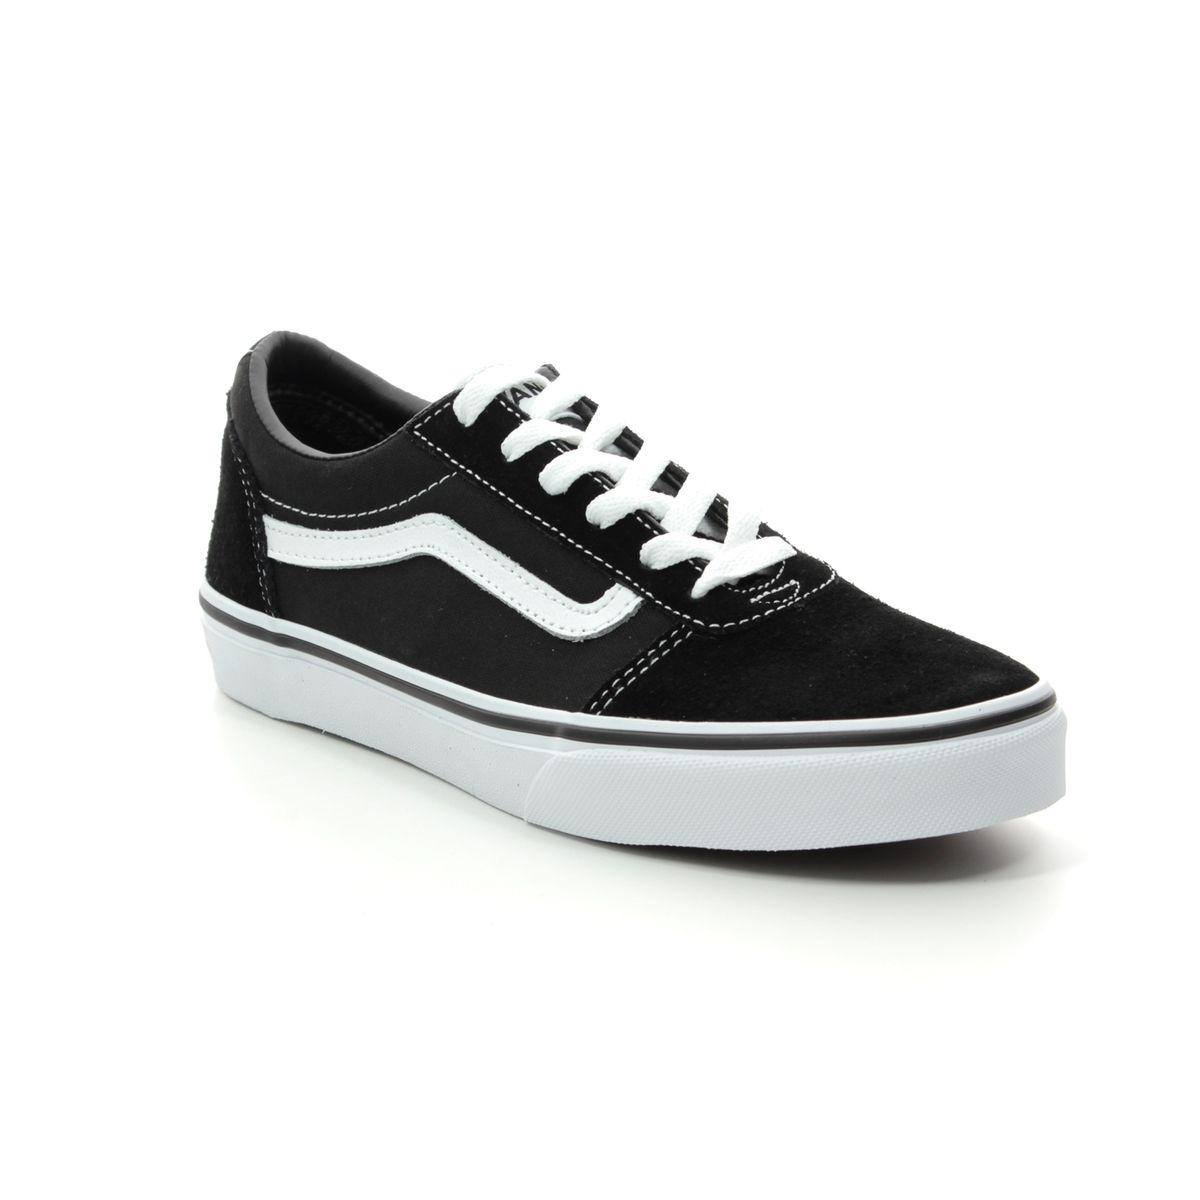 9482bf31a8 Vans Trainers - Black - VN0A38J9I JU WARD YTH